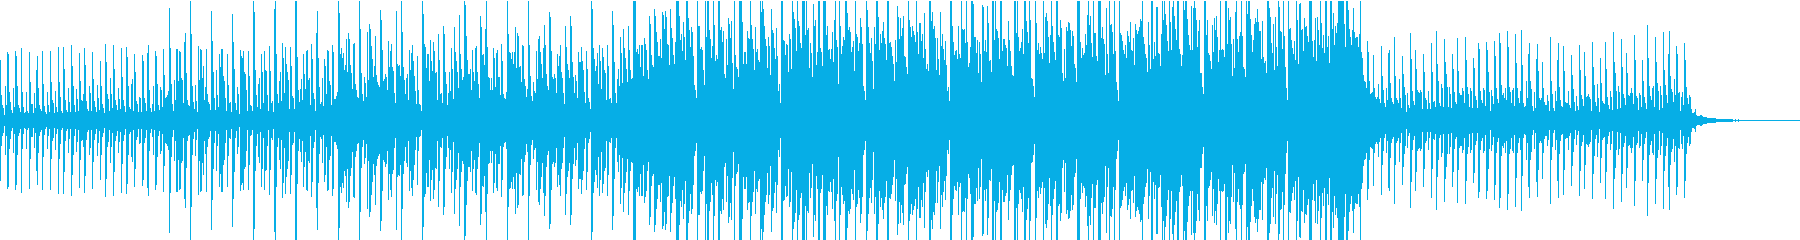 CM向けシンセのフレーズが繰り返される曲の再生済みの波形